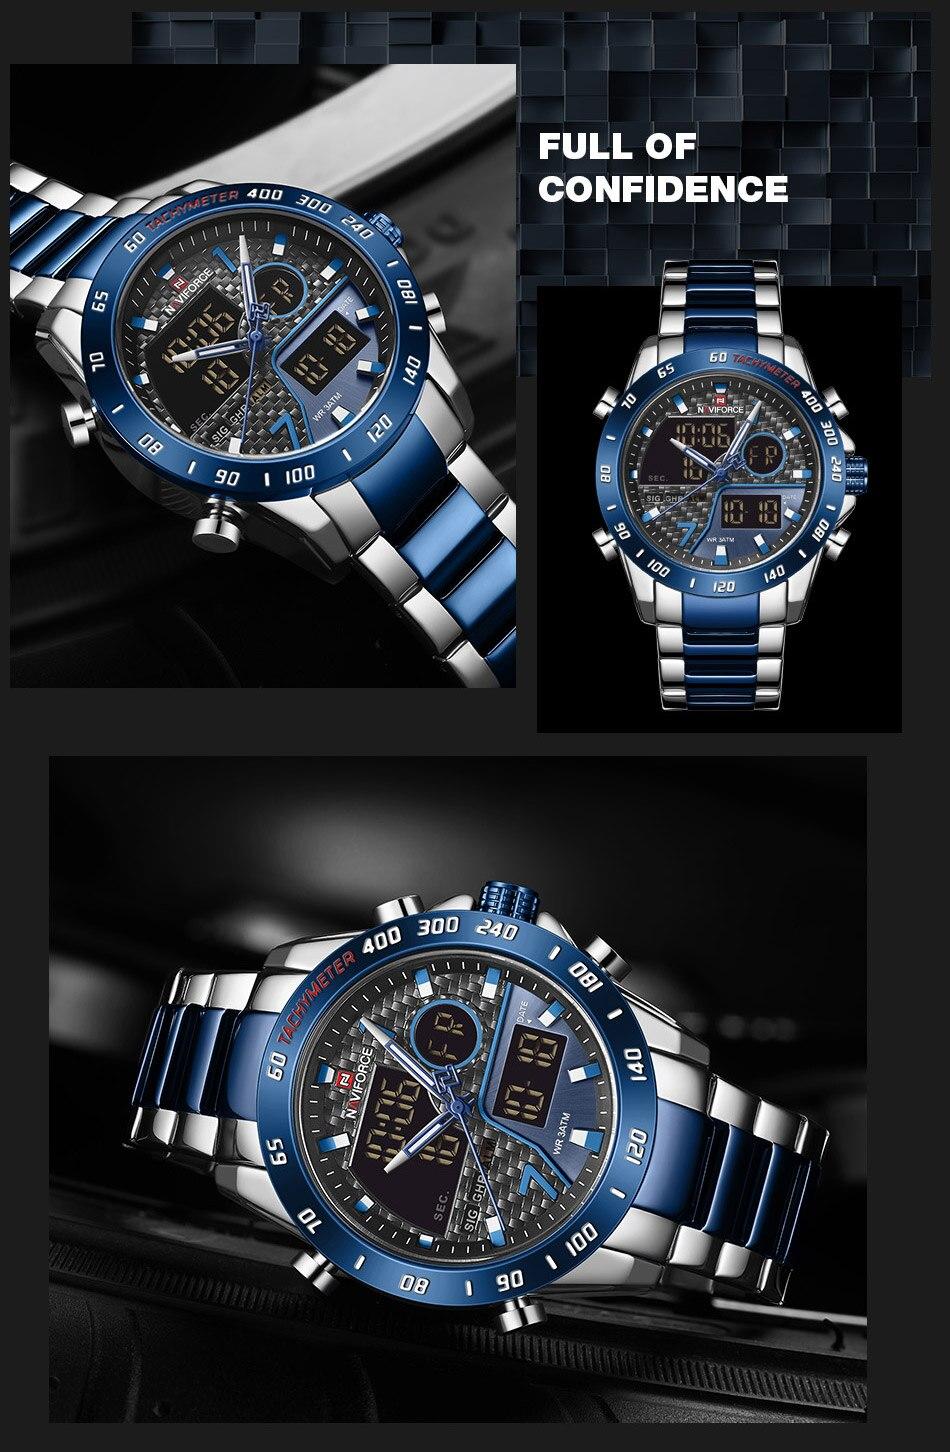 H3f4bcfebb8344b188ead32e6c22c4f4bg NAVIFORCE Men Digital Watch LED Sport Military Mens Quartz Wristwatch Male Luminous Waterproof Clock Watches Relogio Masculino